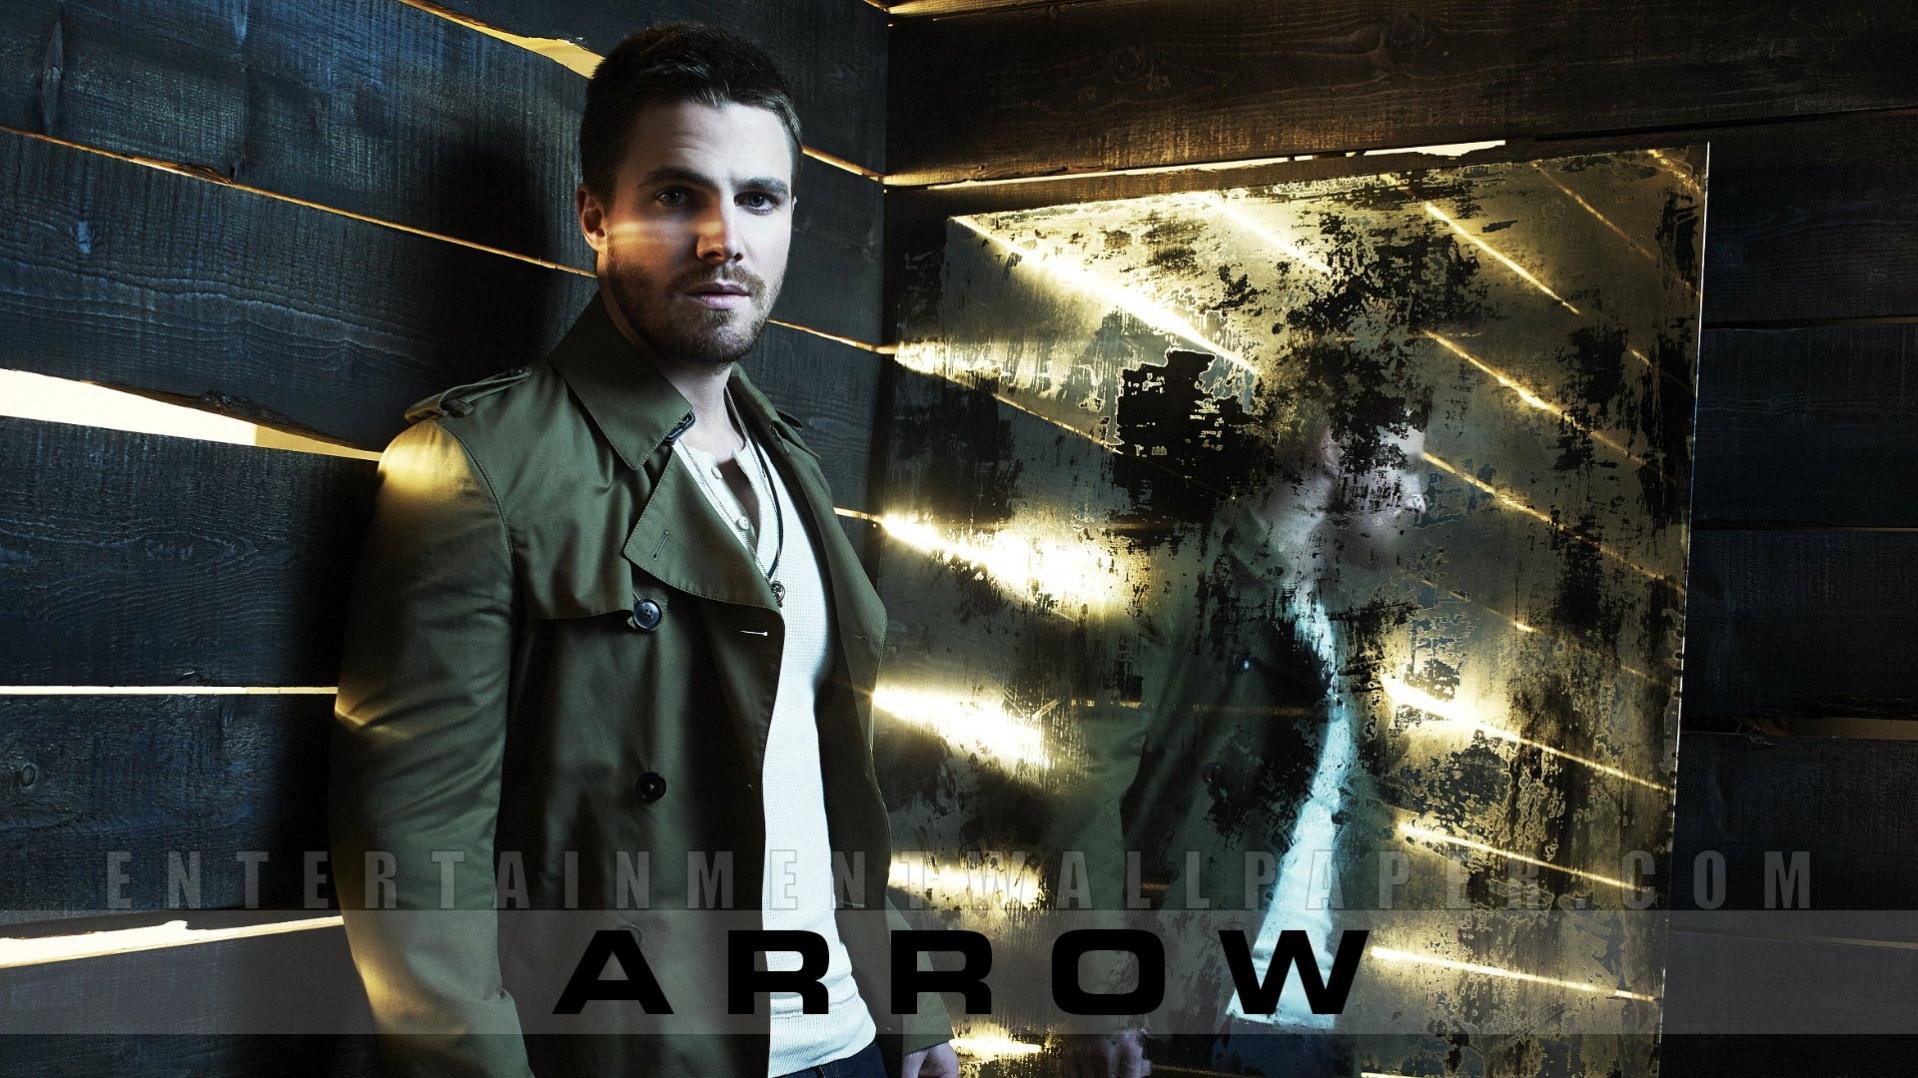 Revolution Tv Series Wallpapers: Arrow TV Show Wallpaper